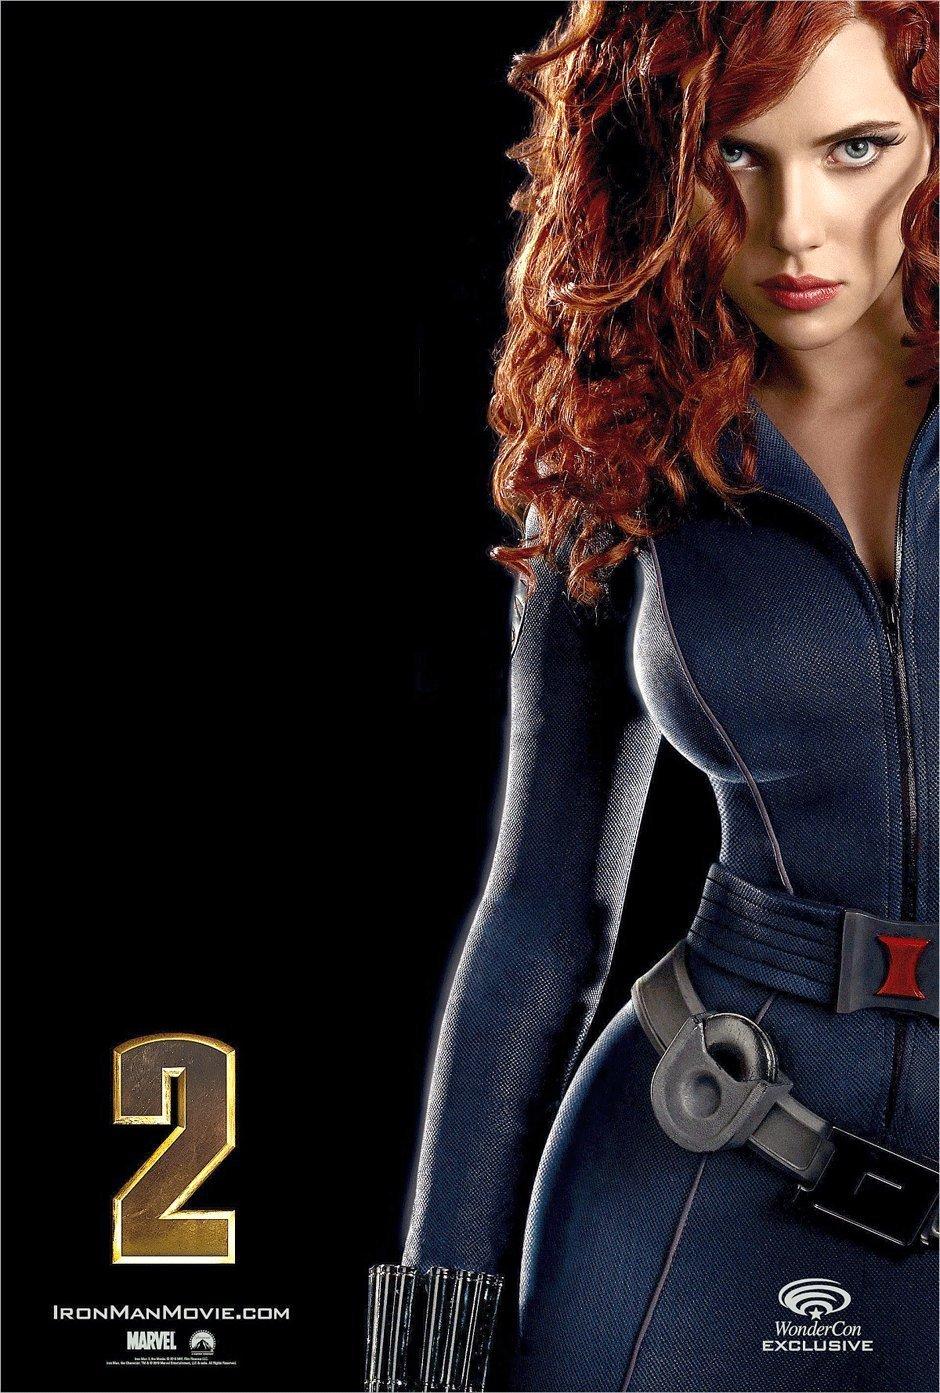 Scarlett johansson black widow poster - photo#1